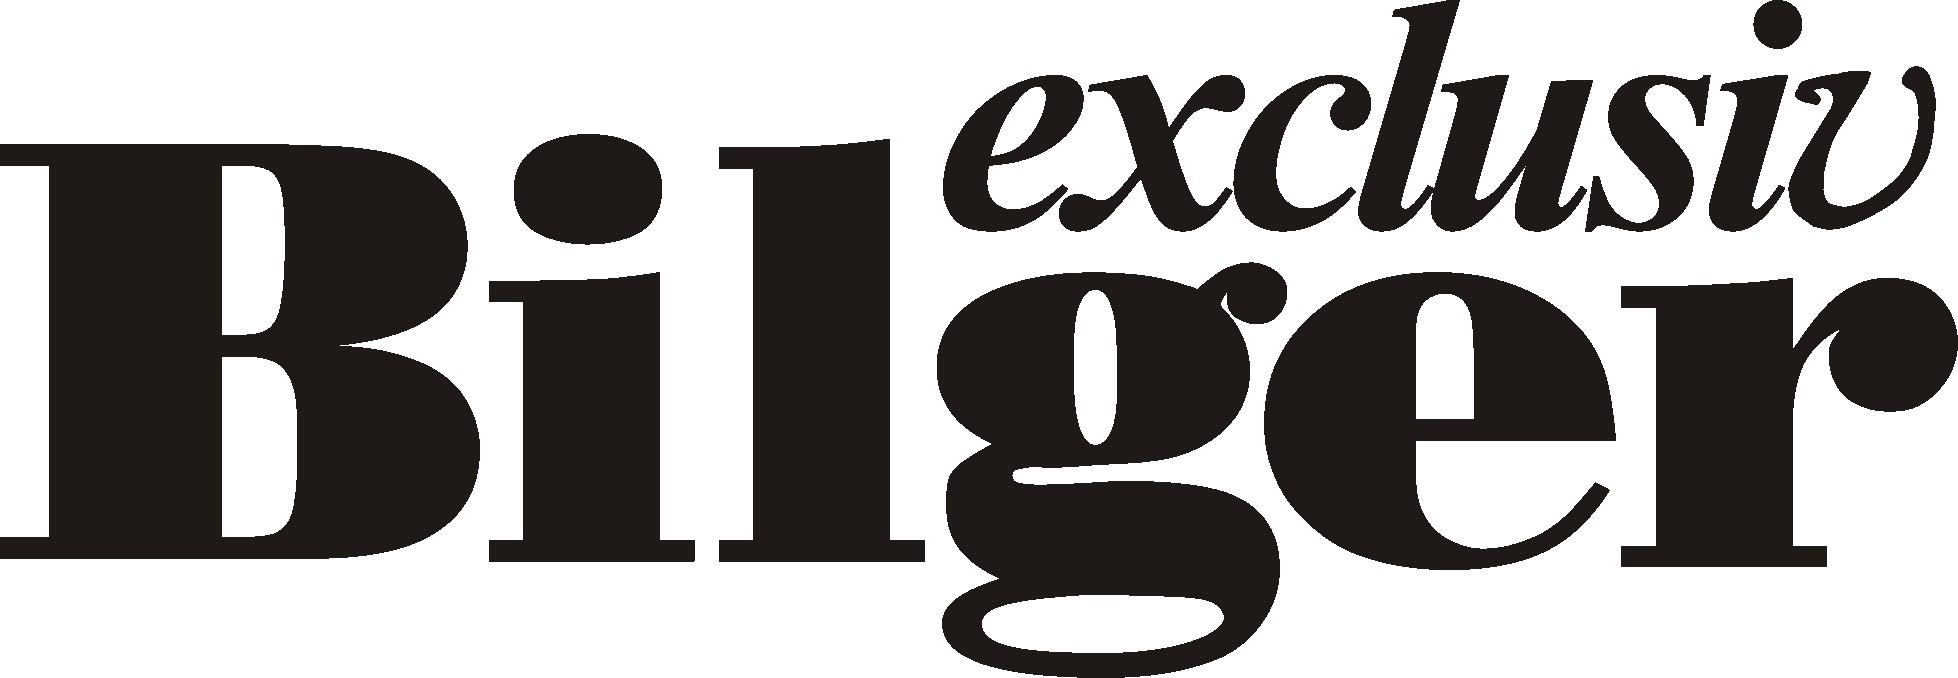 Modehaus Bilger Exclusiv